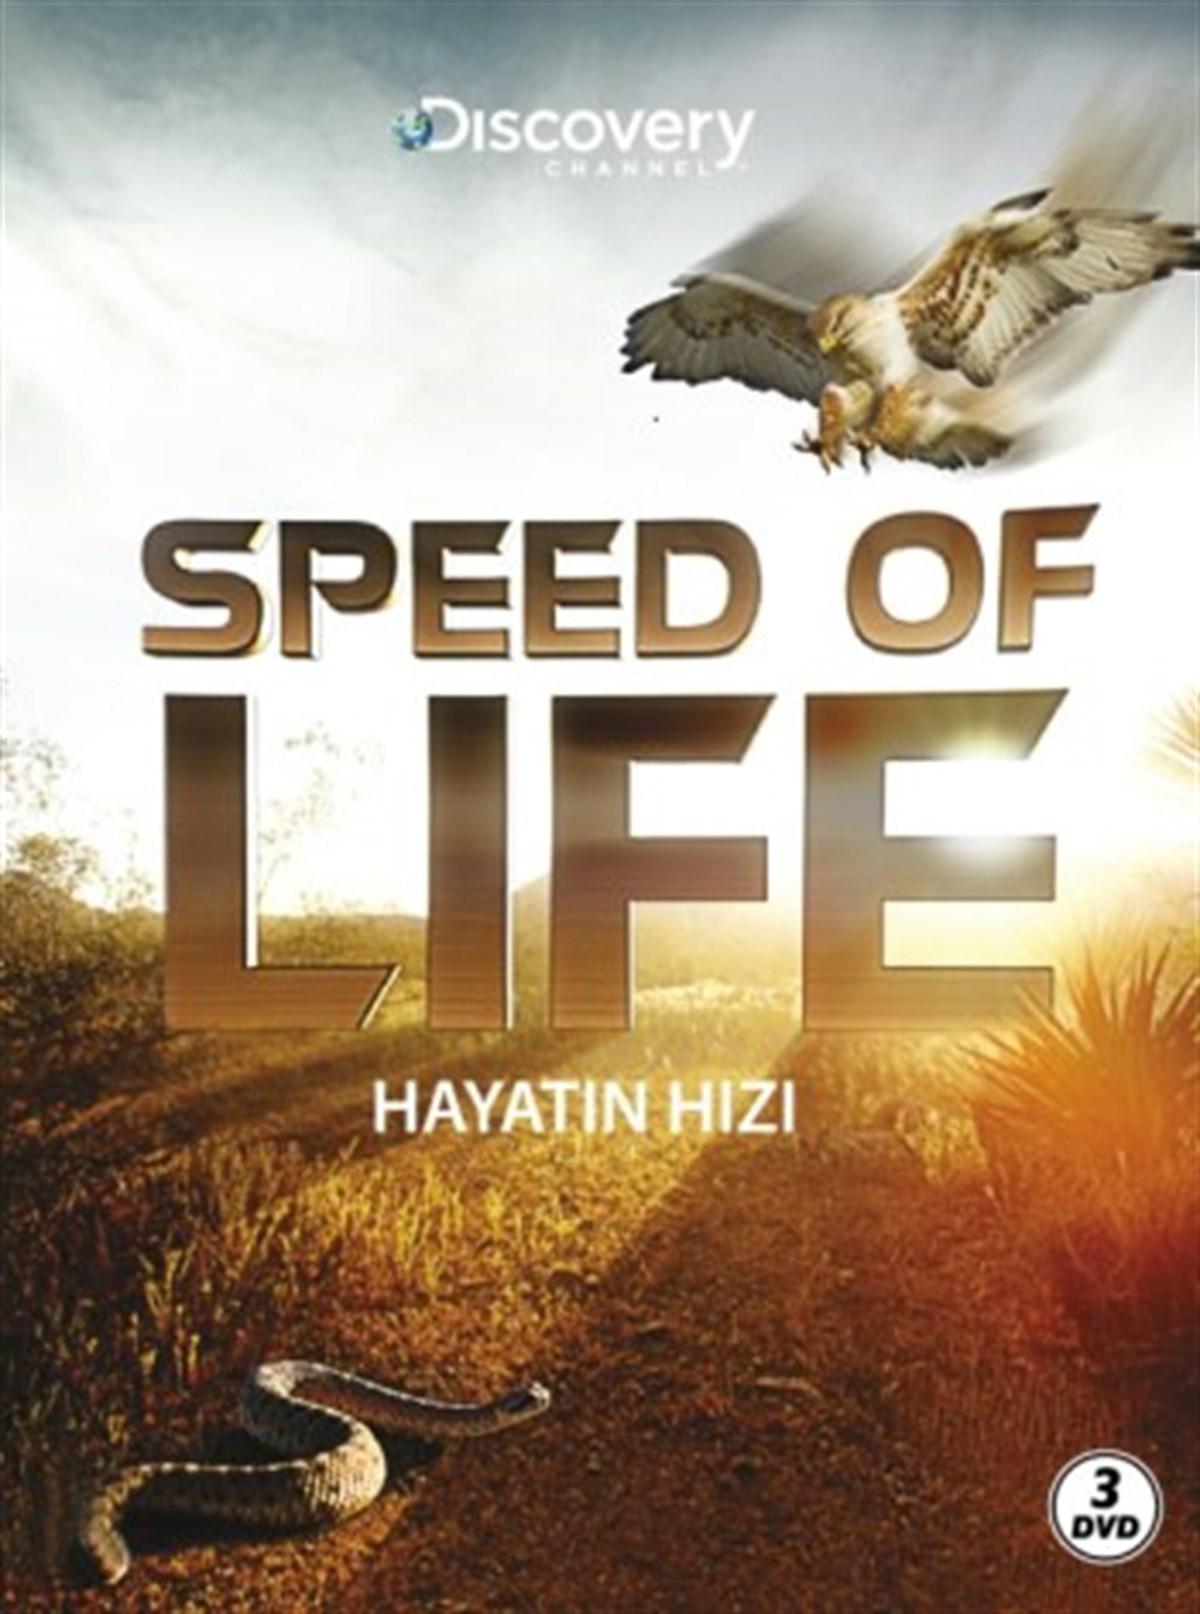 HAYATIN HIZI